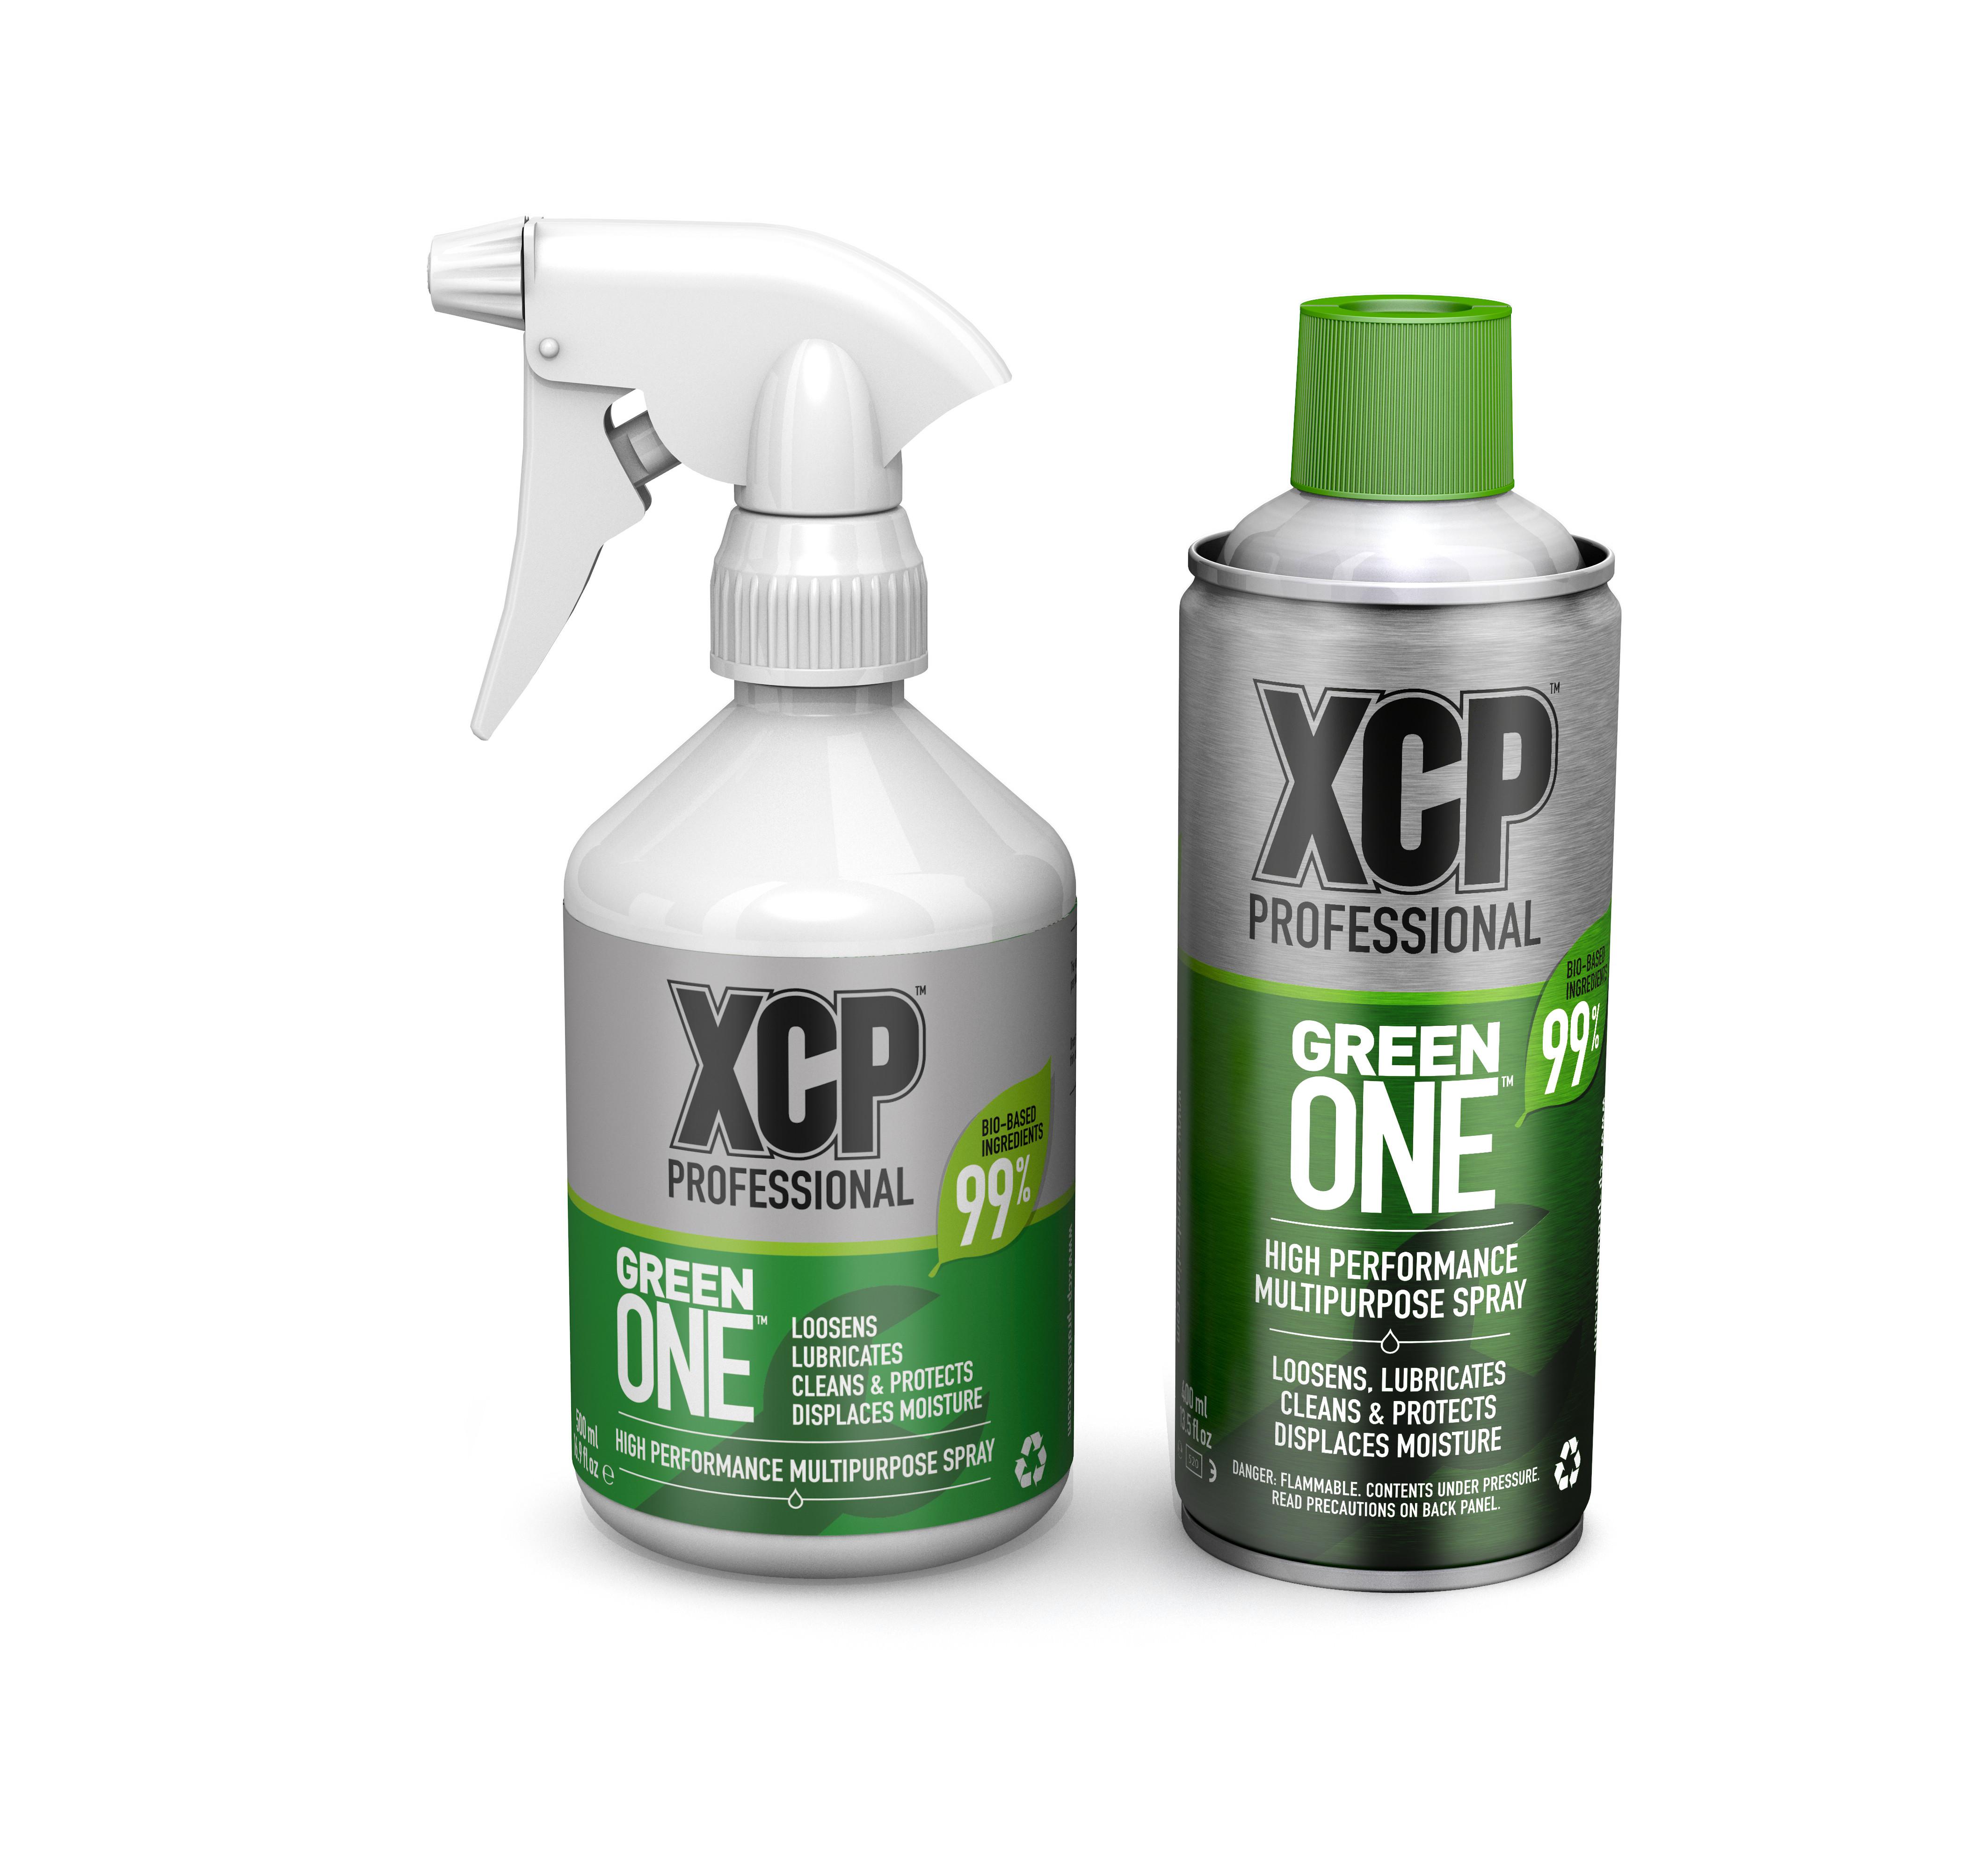 XCP_GREEN_ONE.jpg